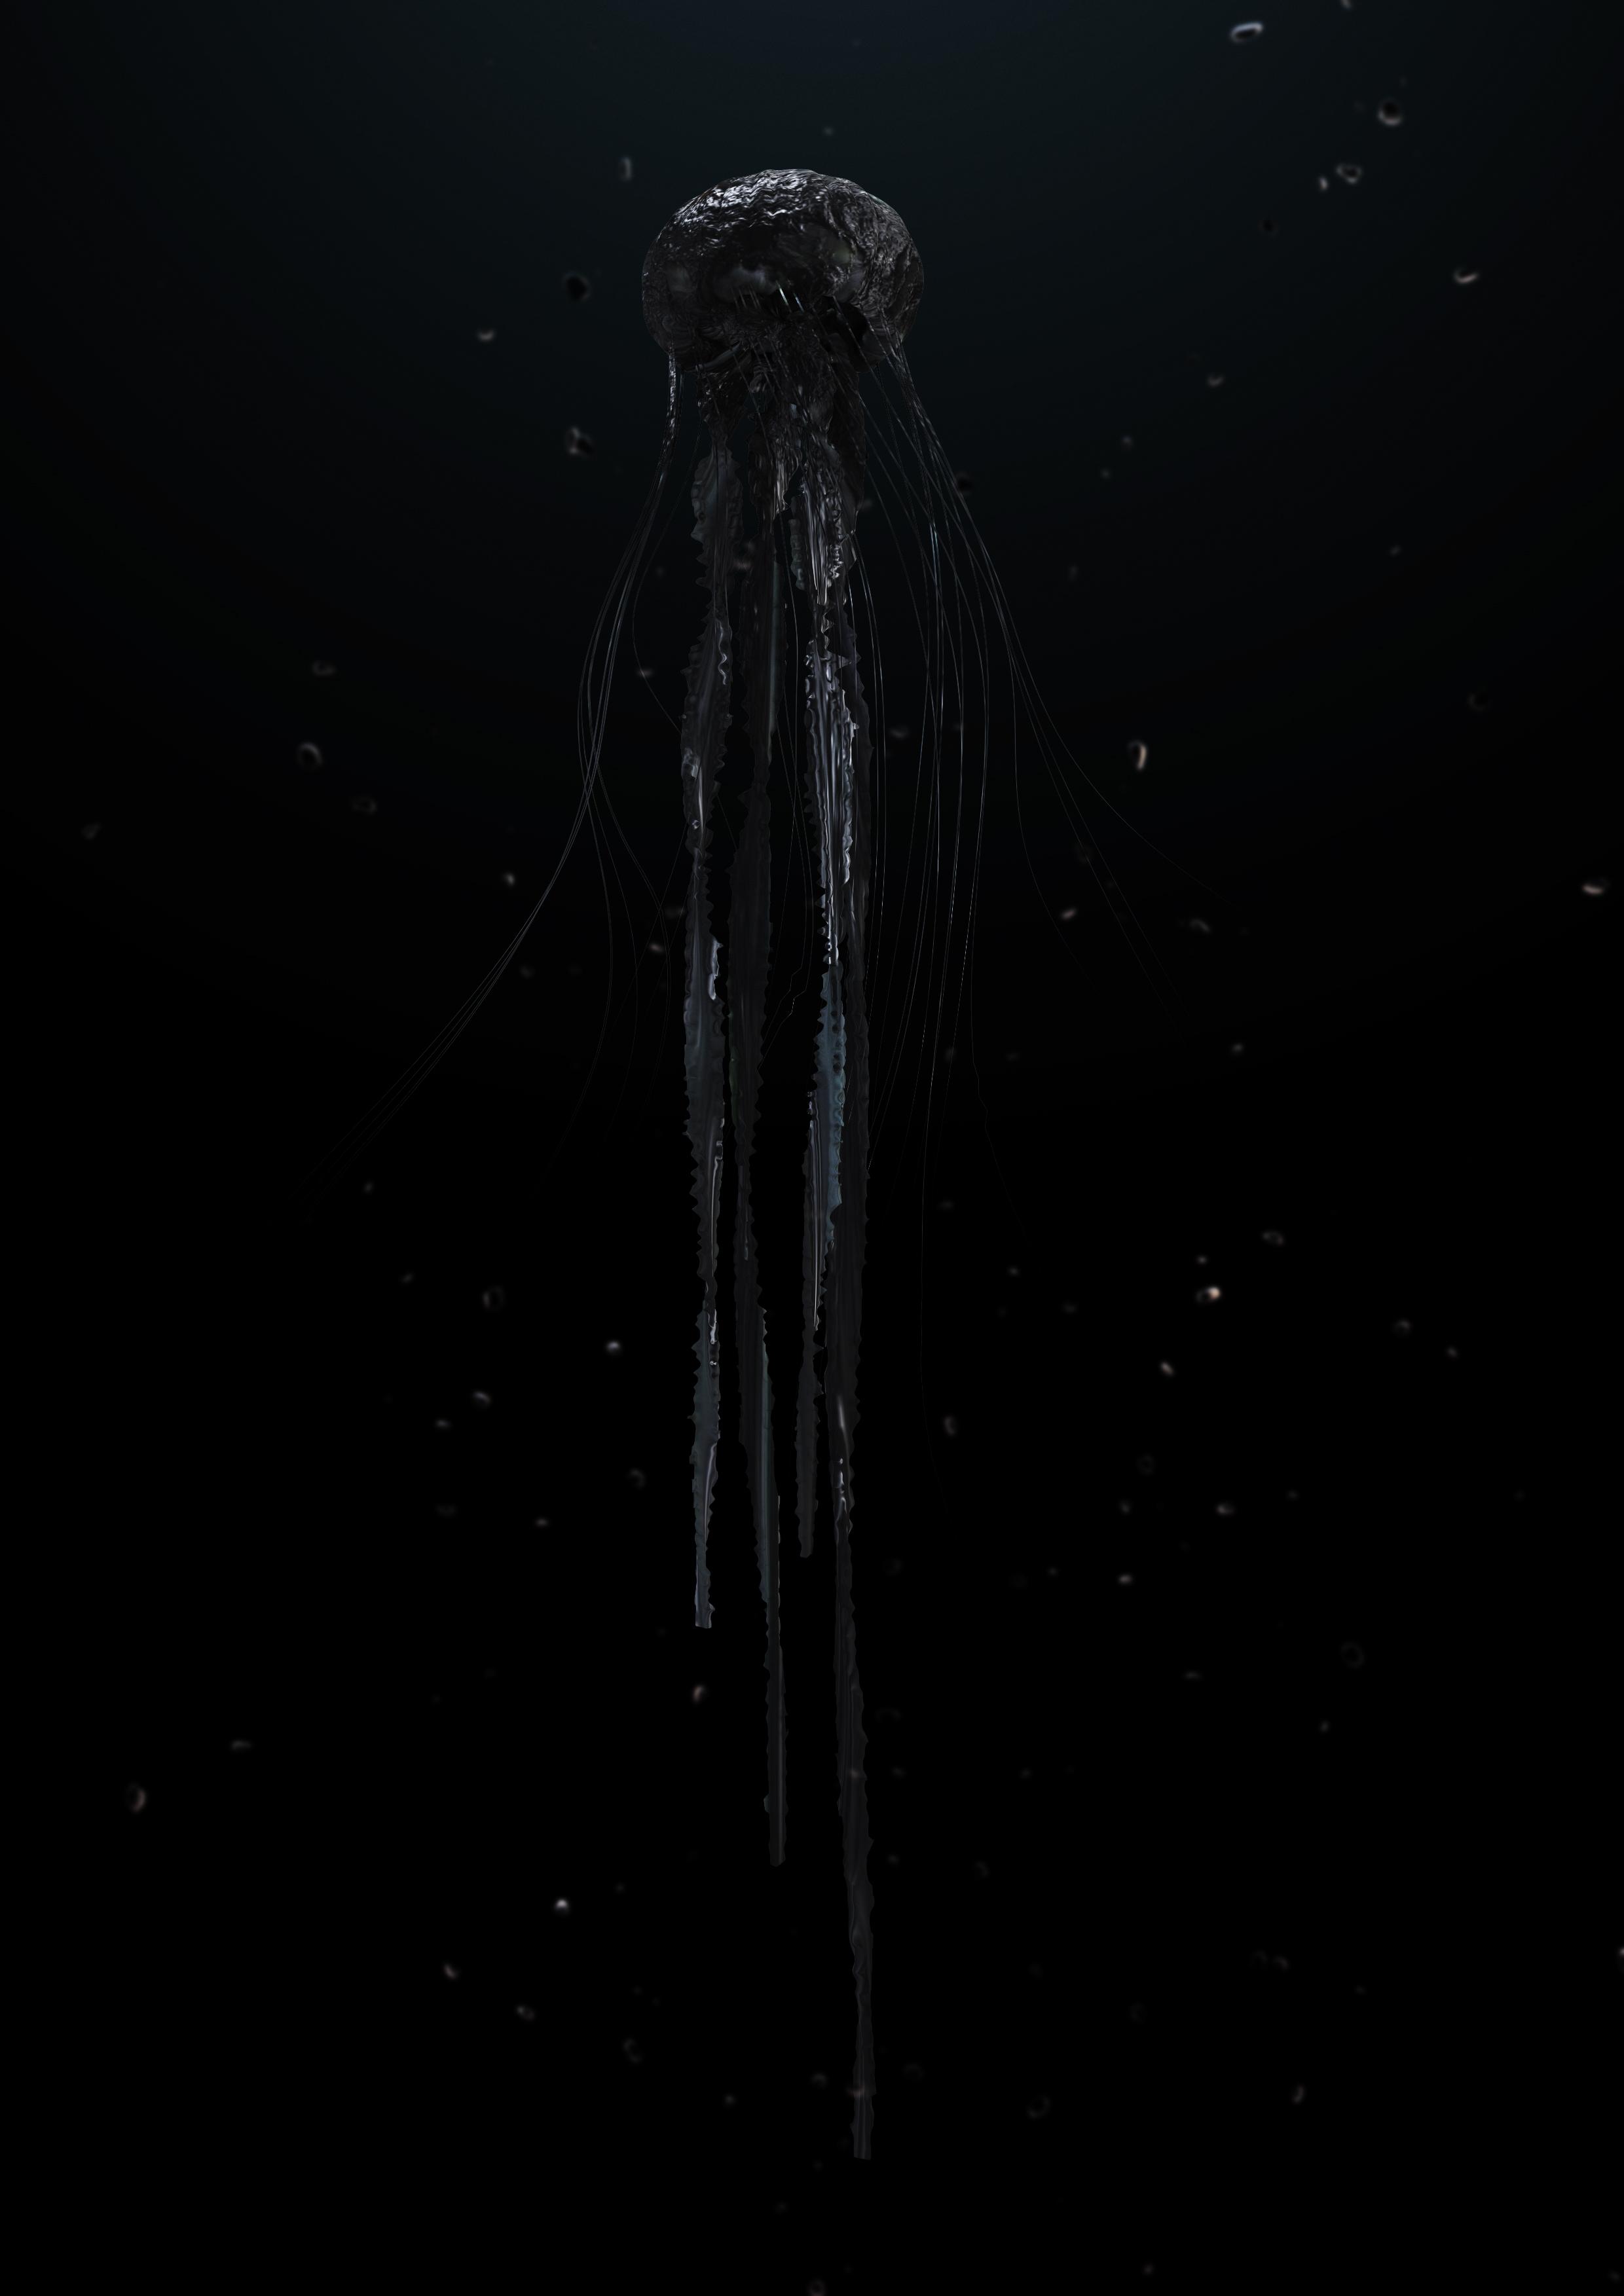 160530_Jellyfish-black-02